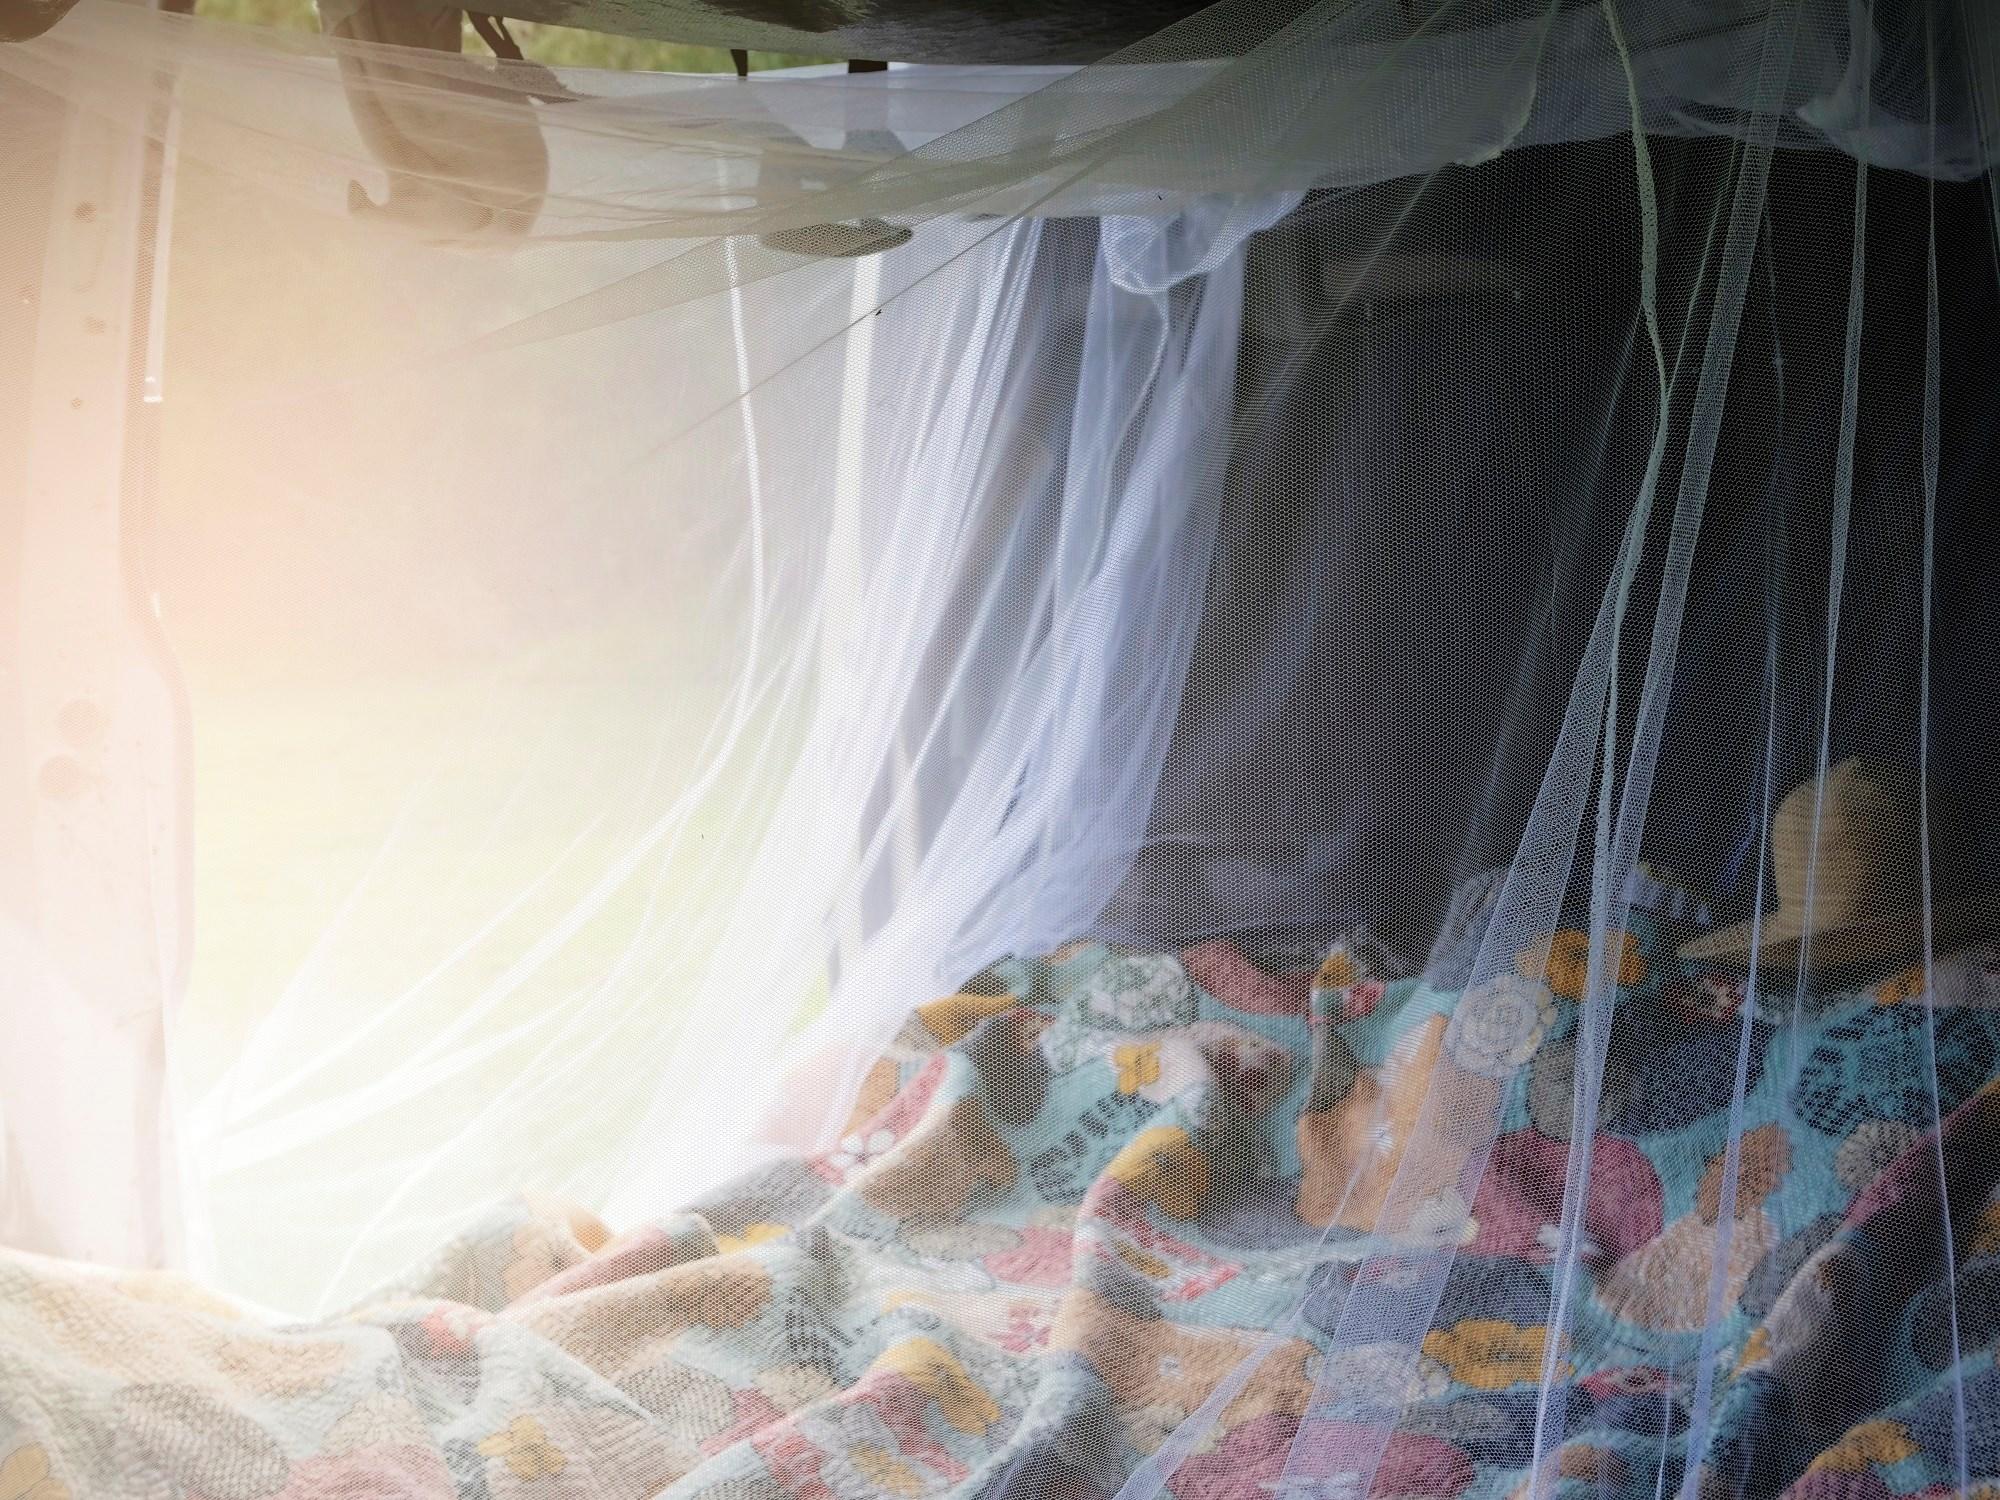 Permethrin Plus Pyriproxyfen-Treated Bednets Reduce Malaria Transmission